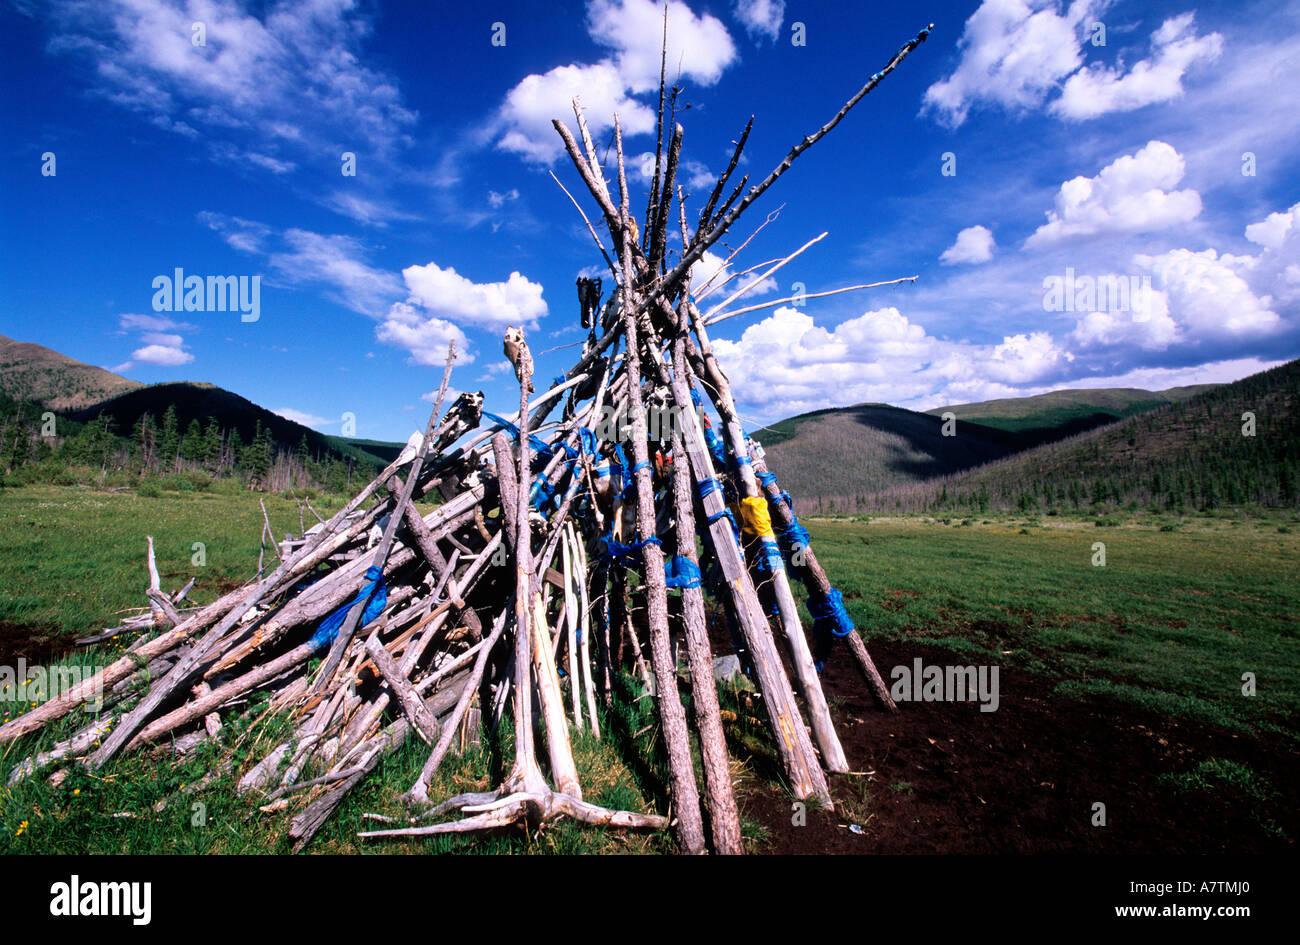 Tipi mongolia